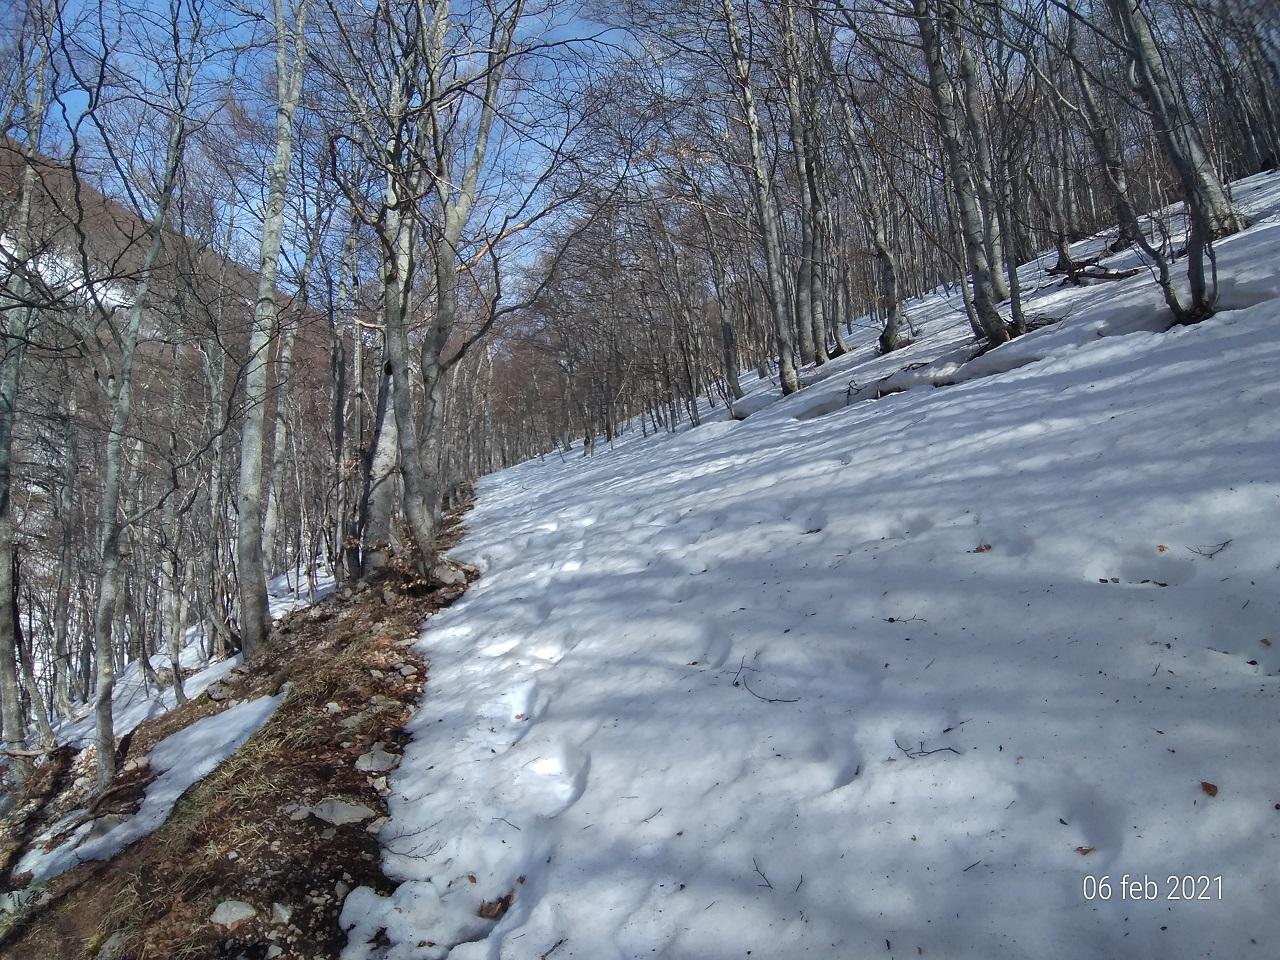 Invernale 2021 su Monte Marrone 1805 metri slm.